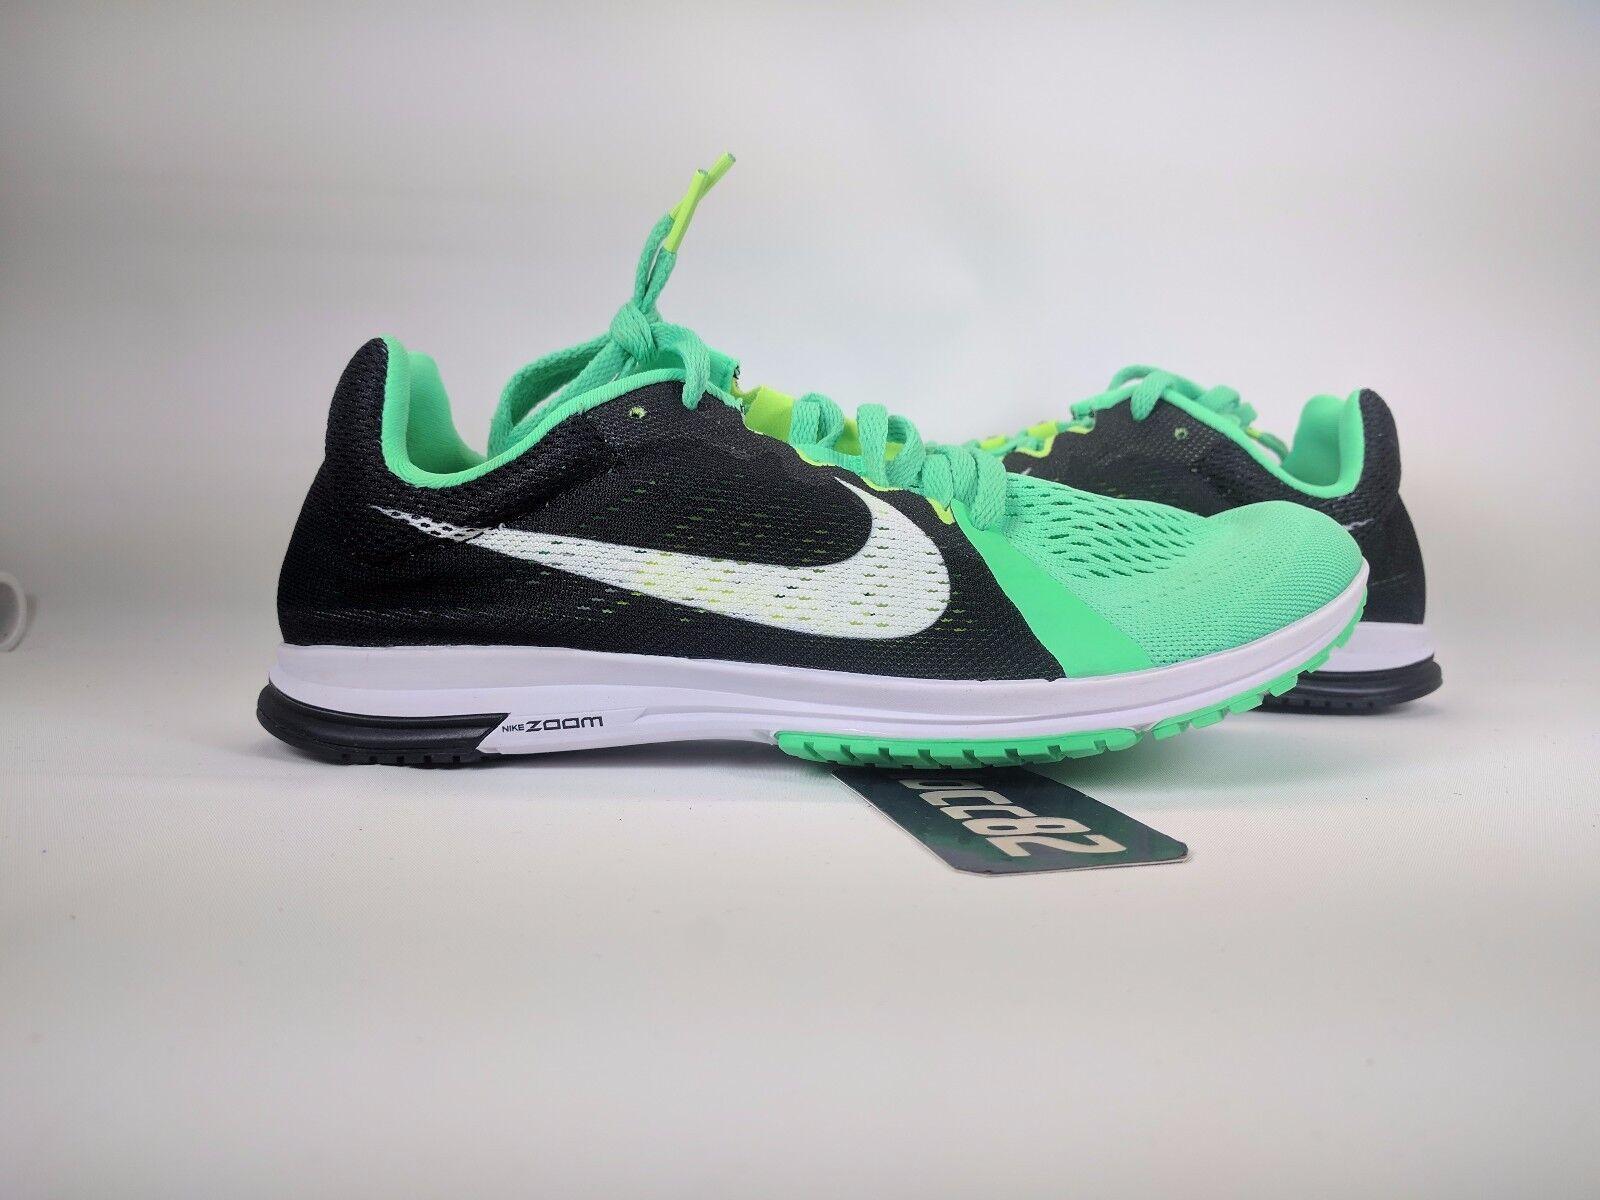 Nike zoom - serie lt 3 frauen  7,5 frauen 3 9 turnschuhe laufschuhe 153e29